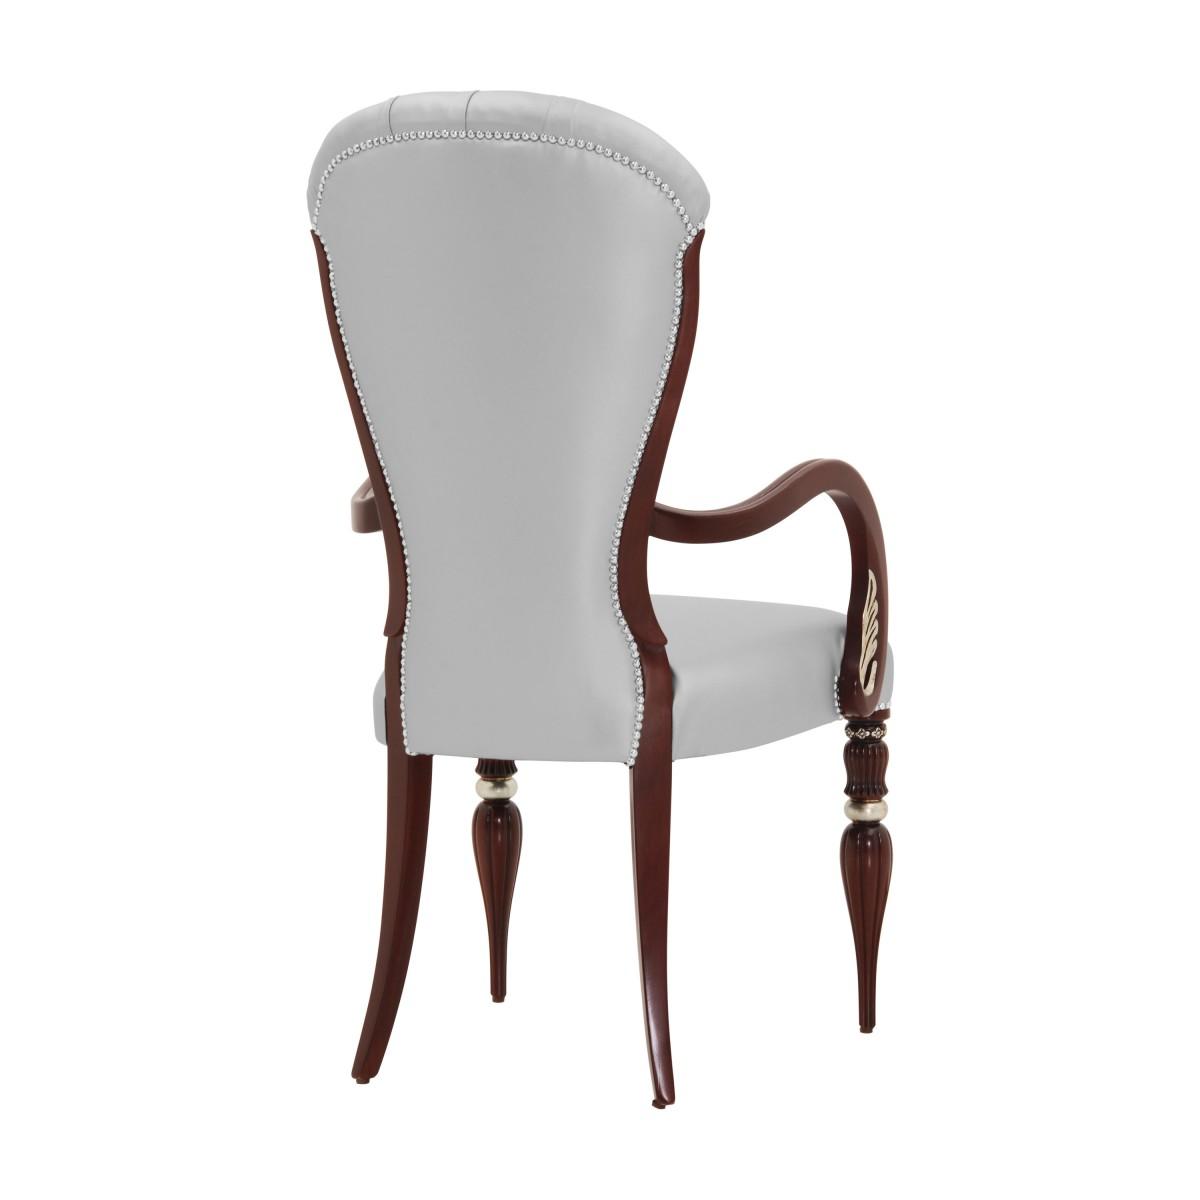 replica armchair adele 1 3924